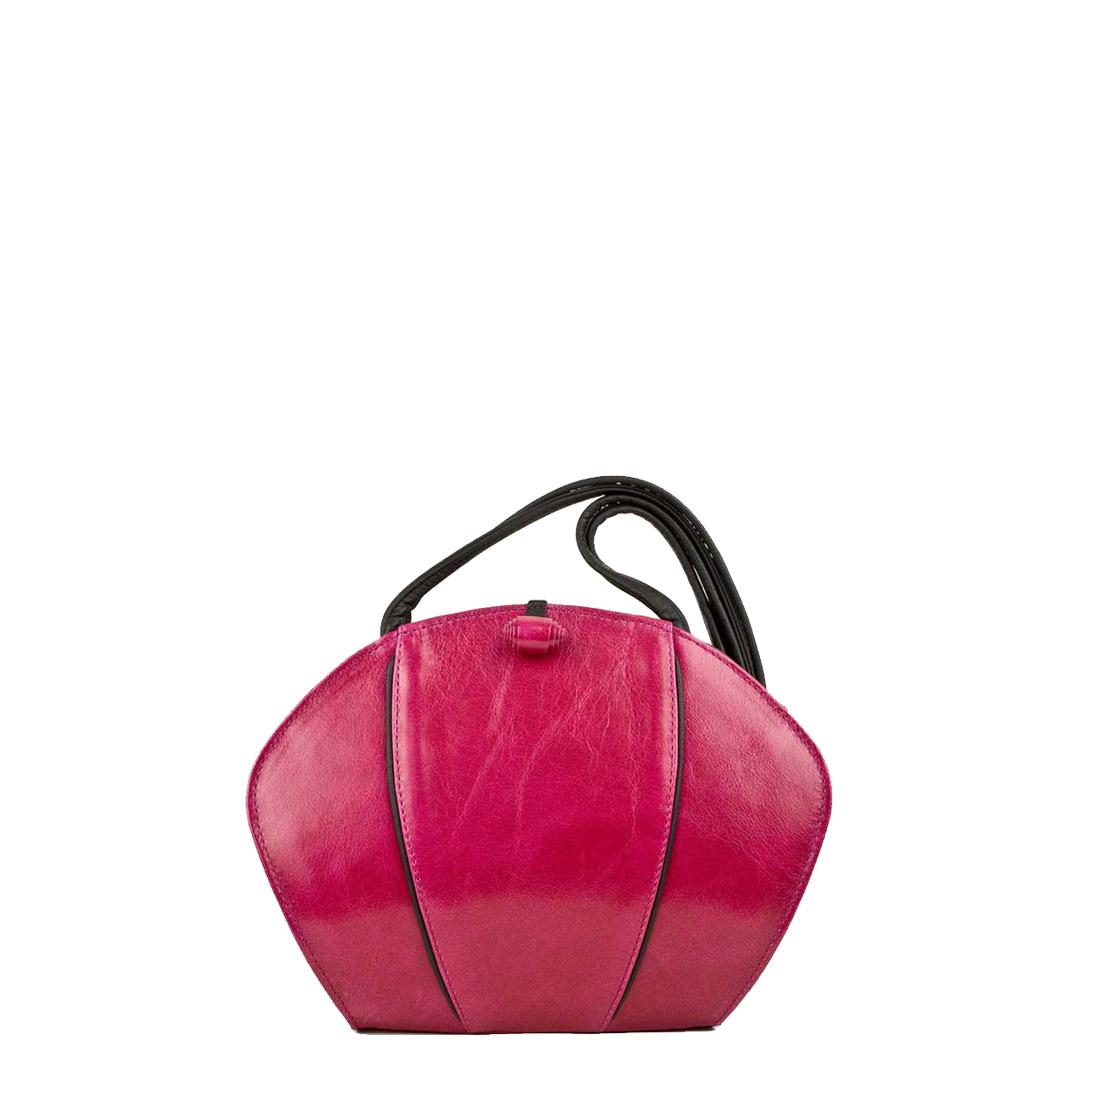 Lola Fuchsia Leather Shoulder Bag